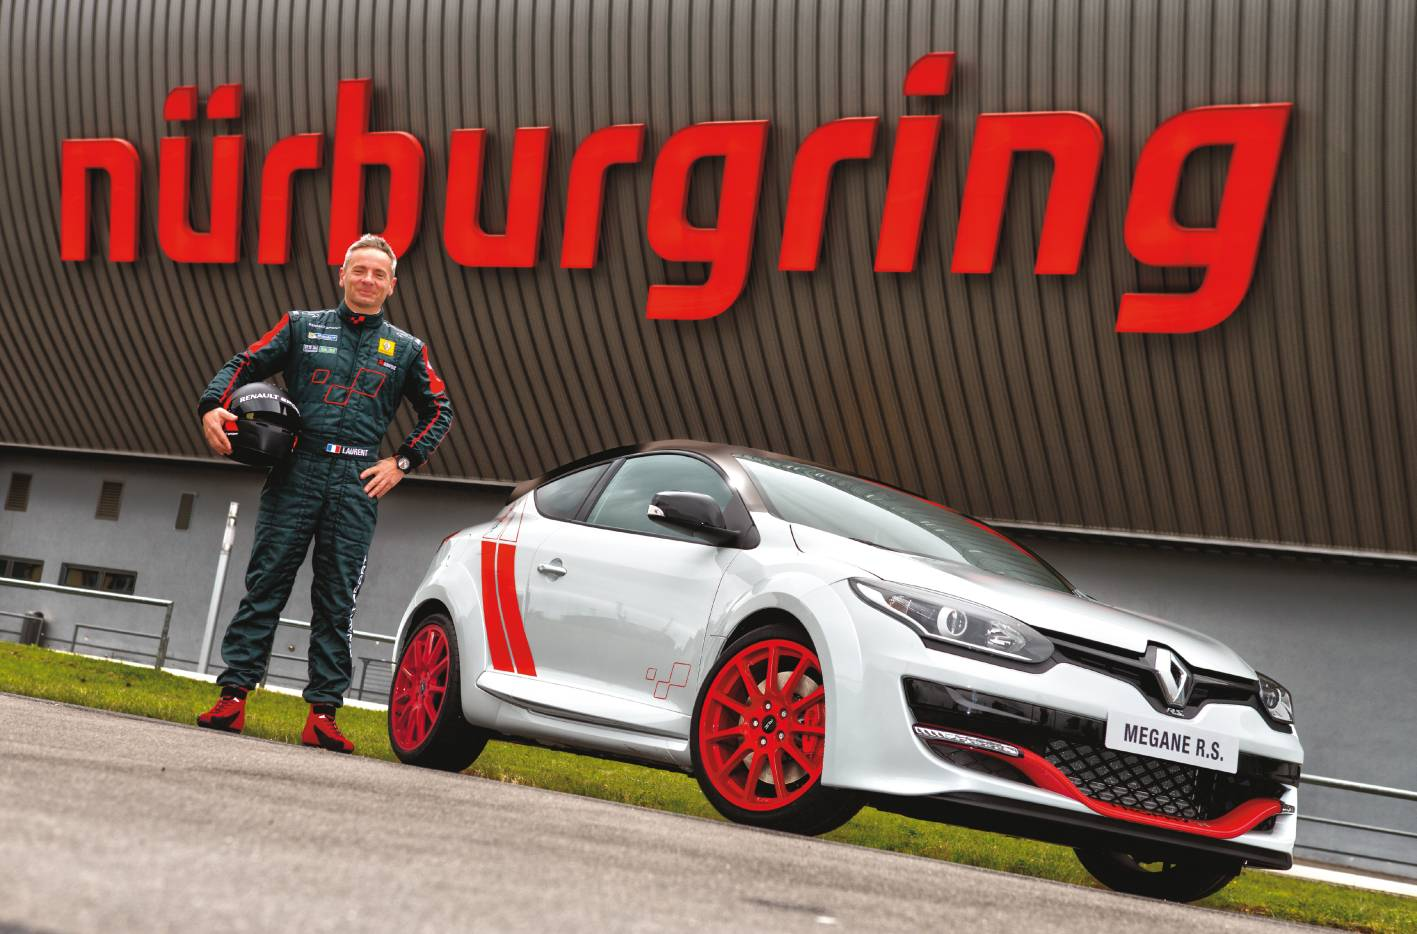 renault cars news m gane r s 275 trophy sets new 39 ring record. Black Bedroom Furniture Sets. Home Design Ideas